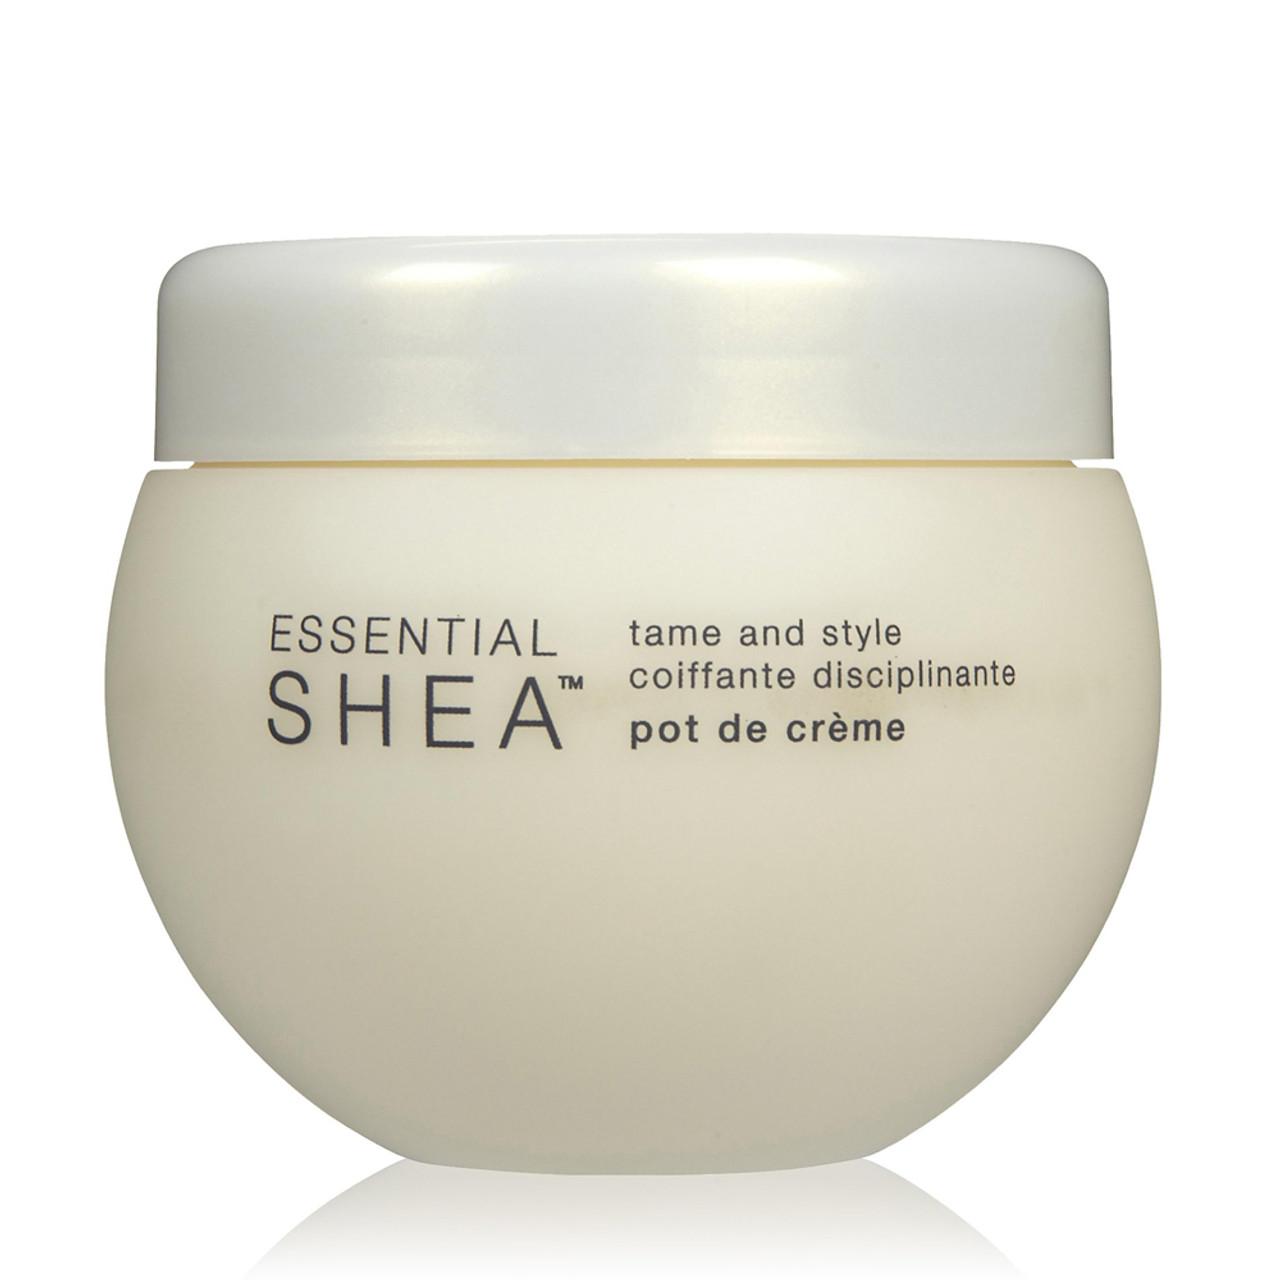 Fekkai Essential Shea Pot de Crème(discontinued)